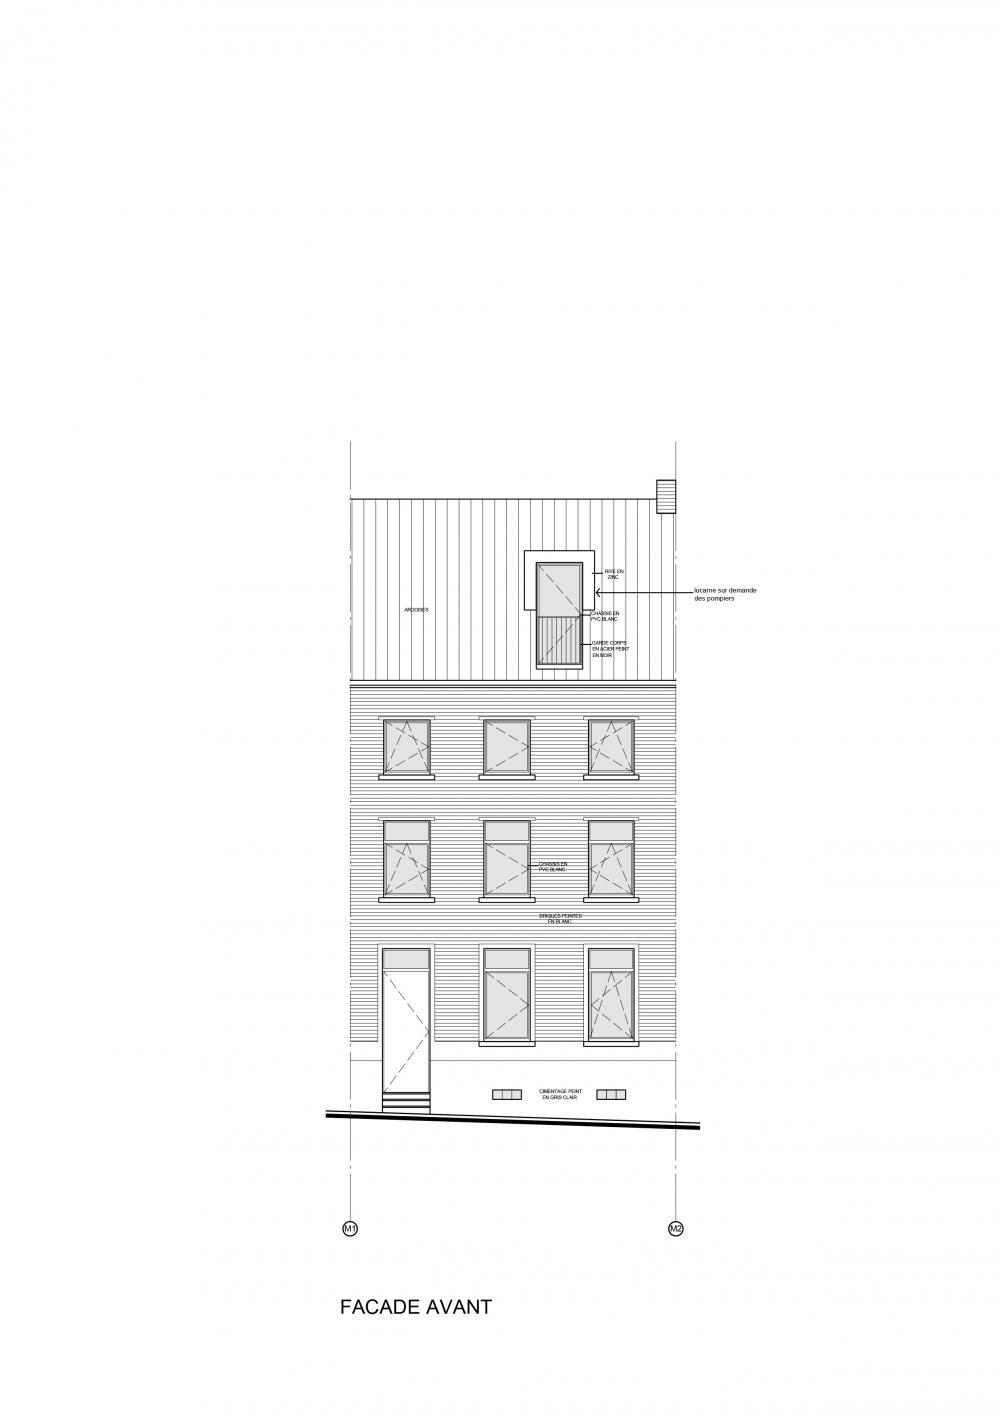 plan de la façade à rue